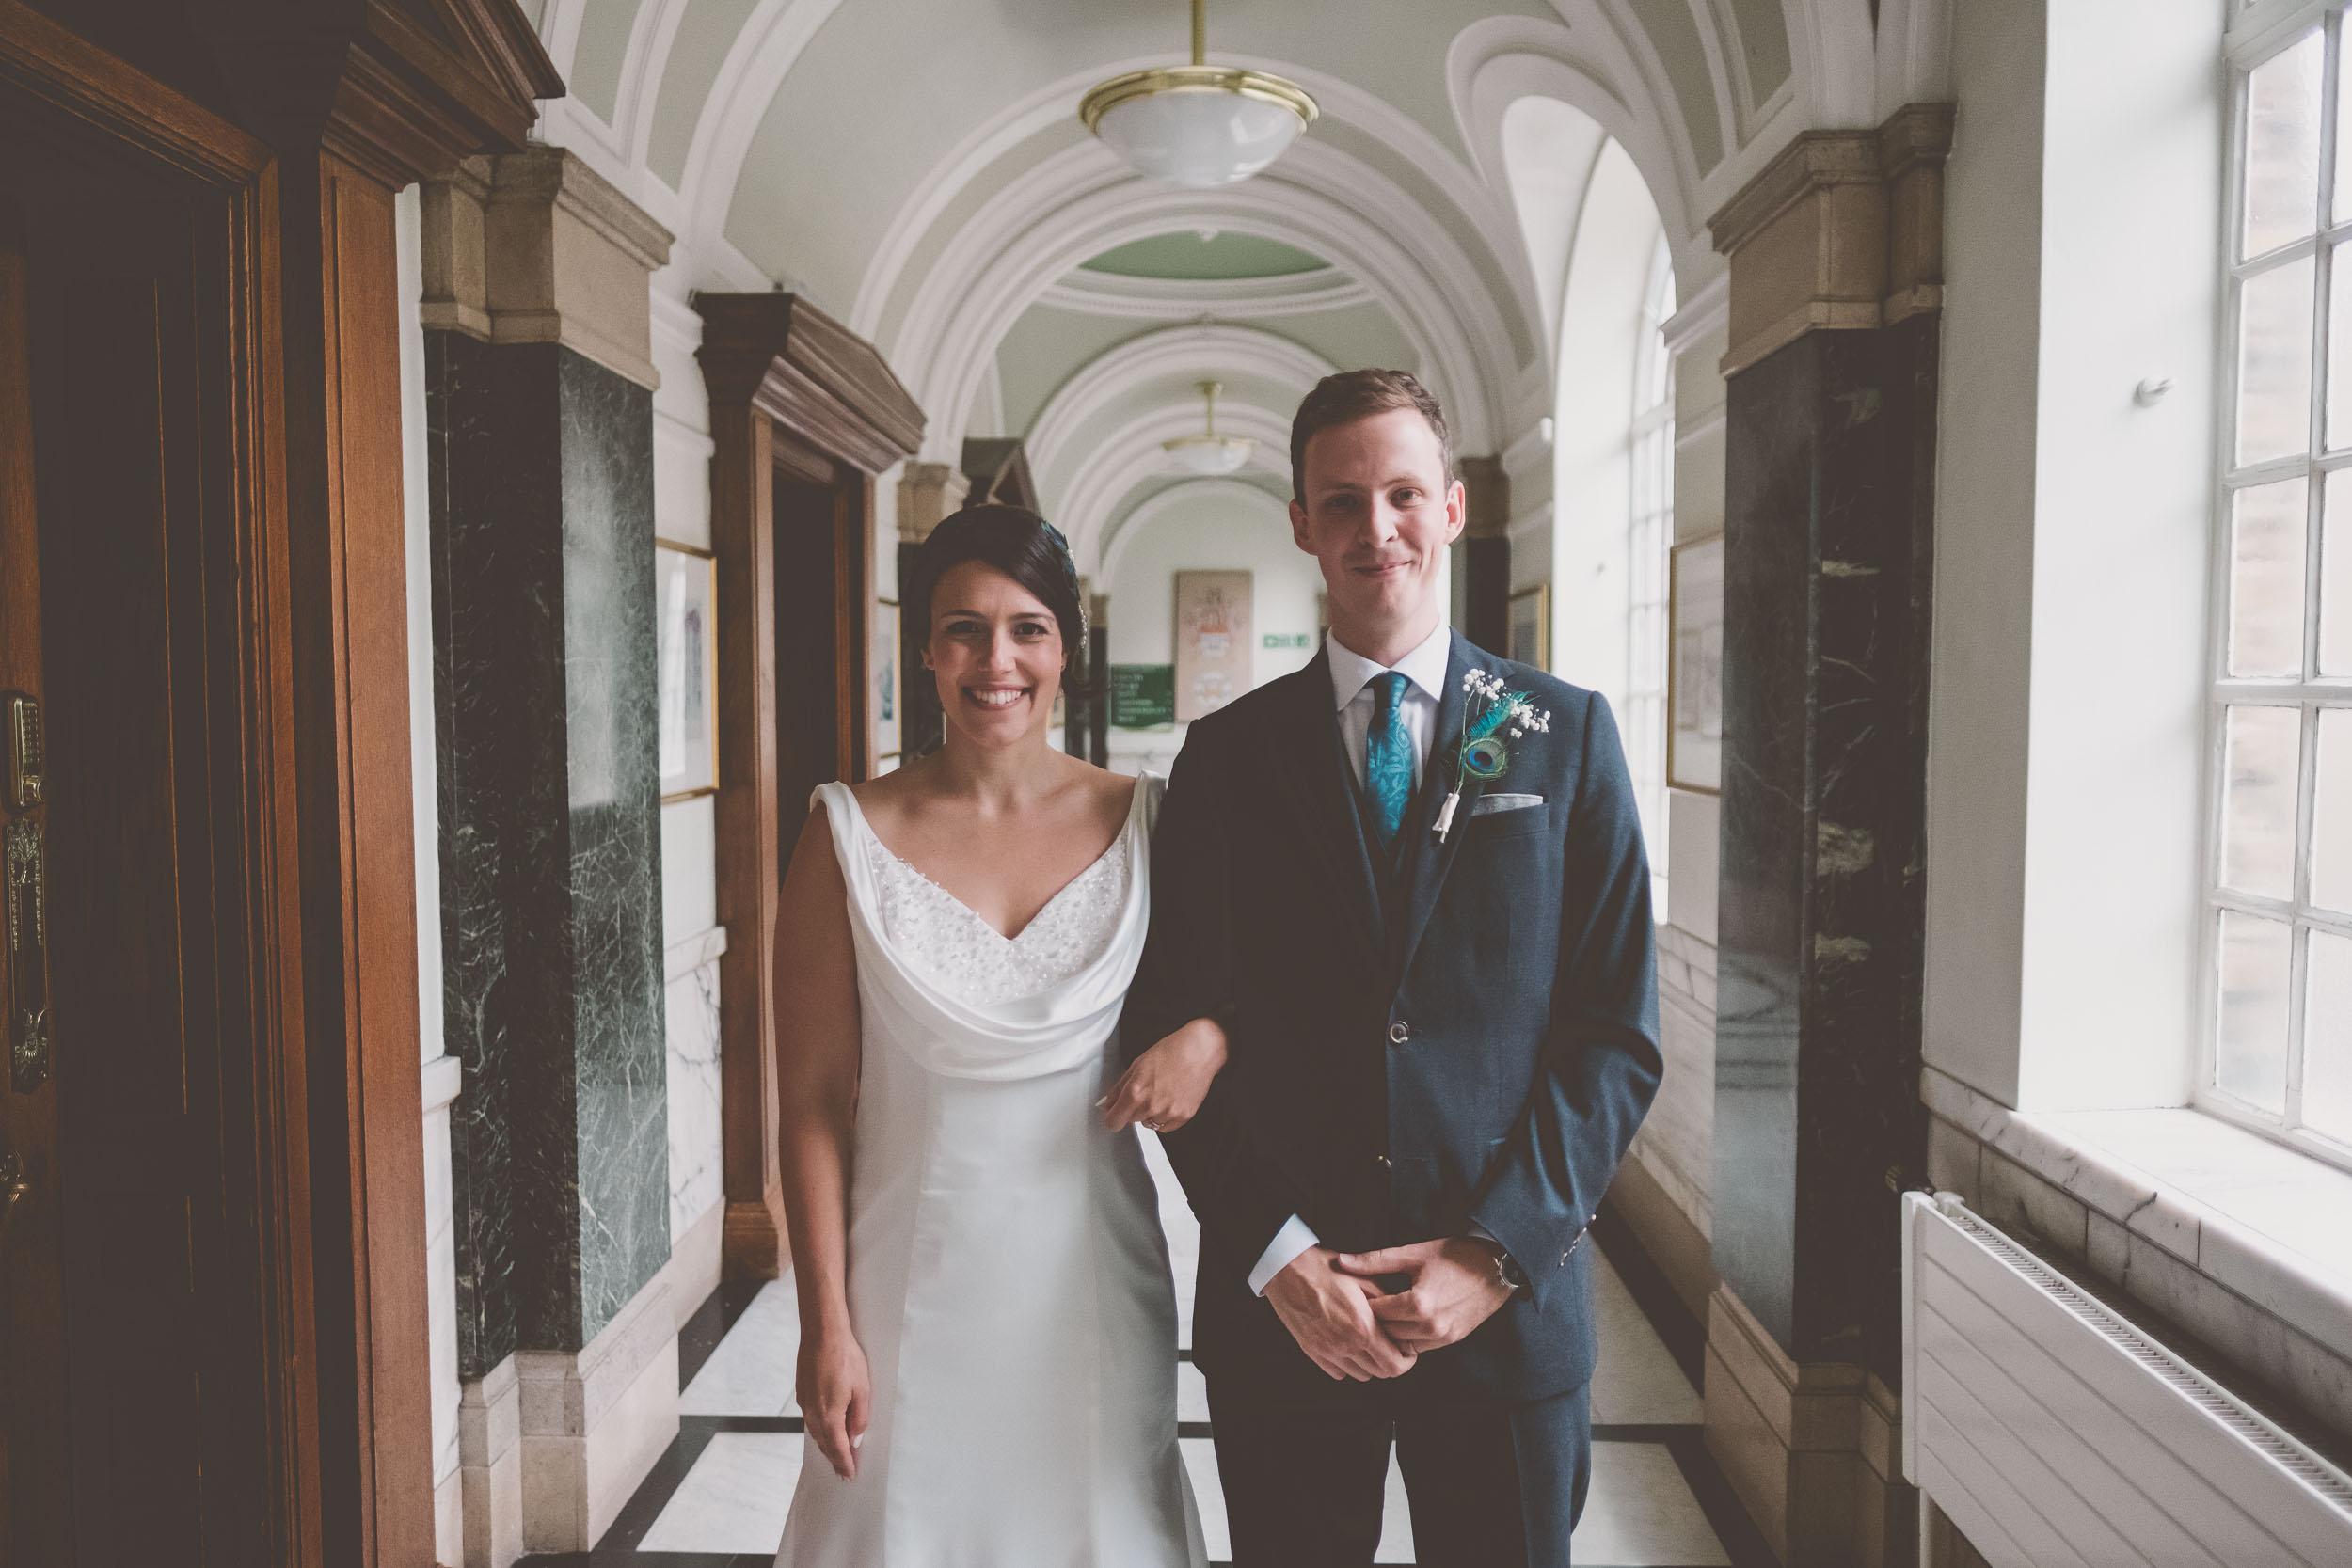 islington-town-hall-4th-floor-studios-wedding134.jpg